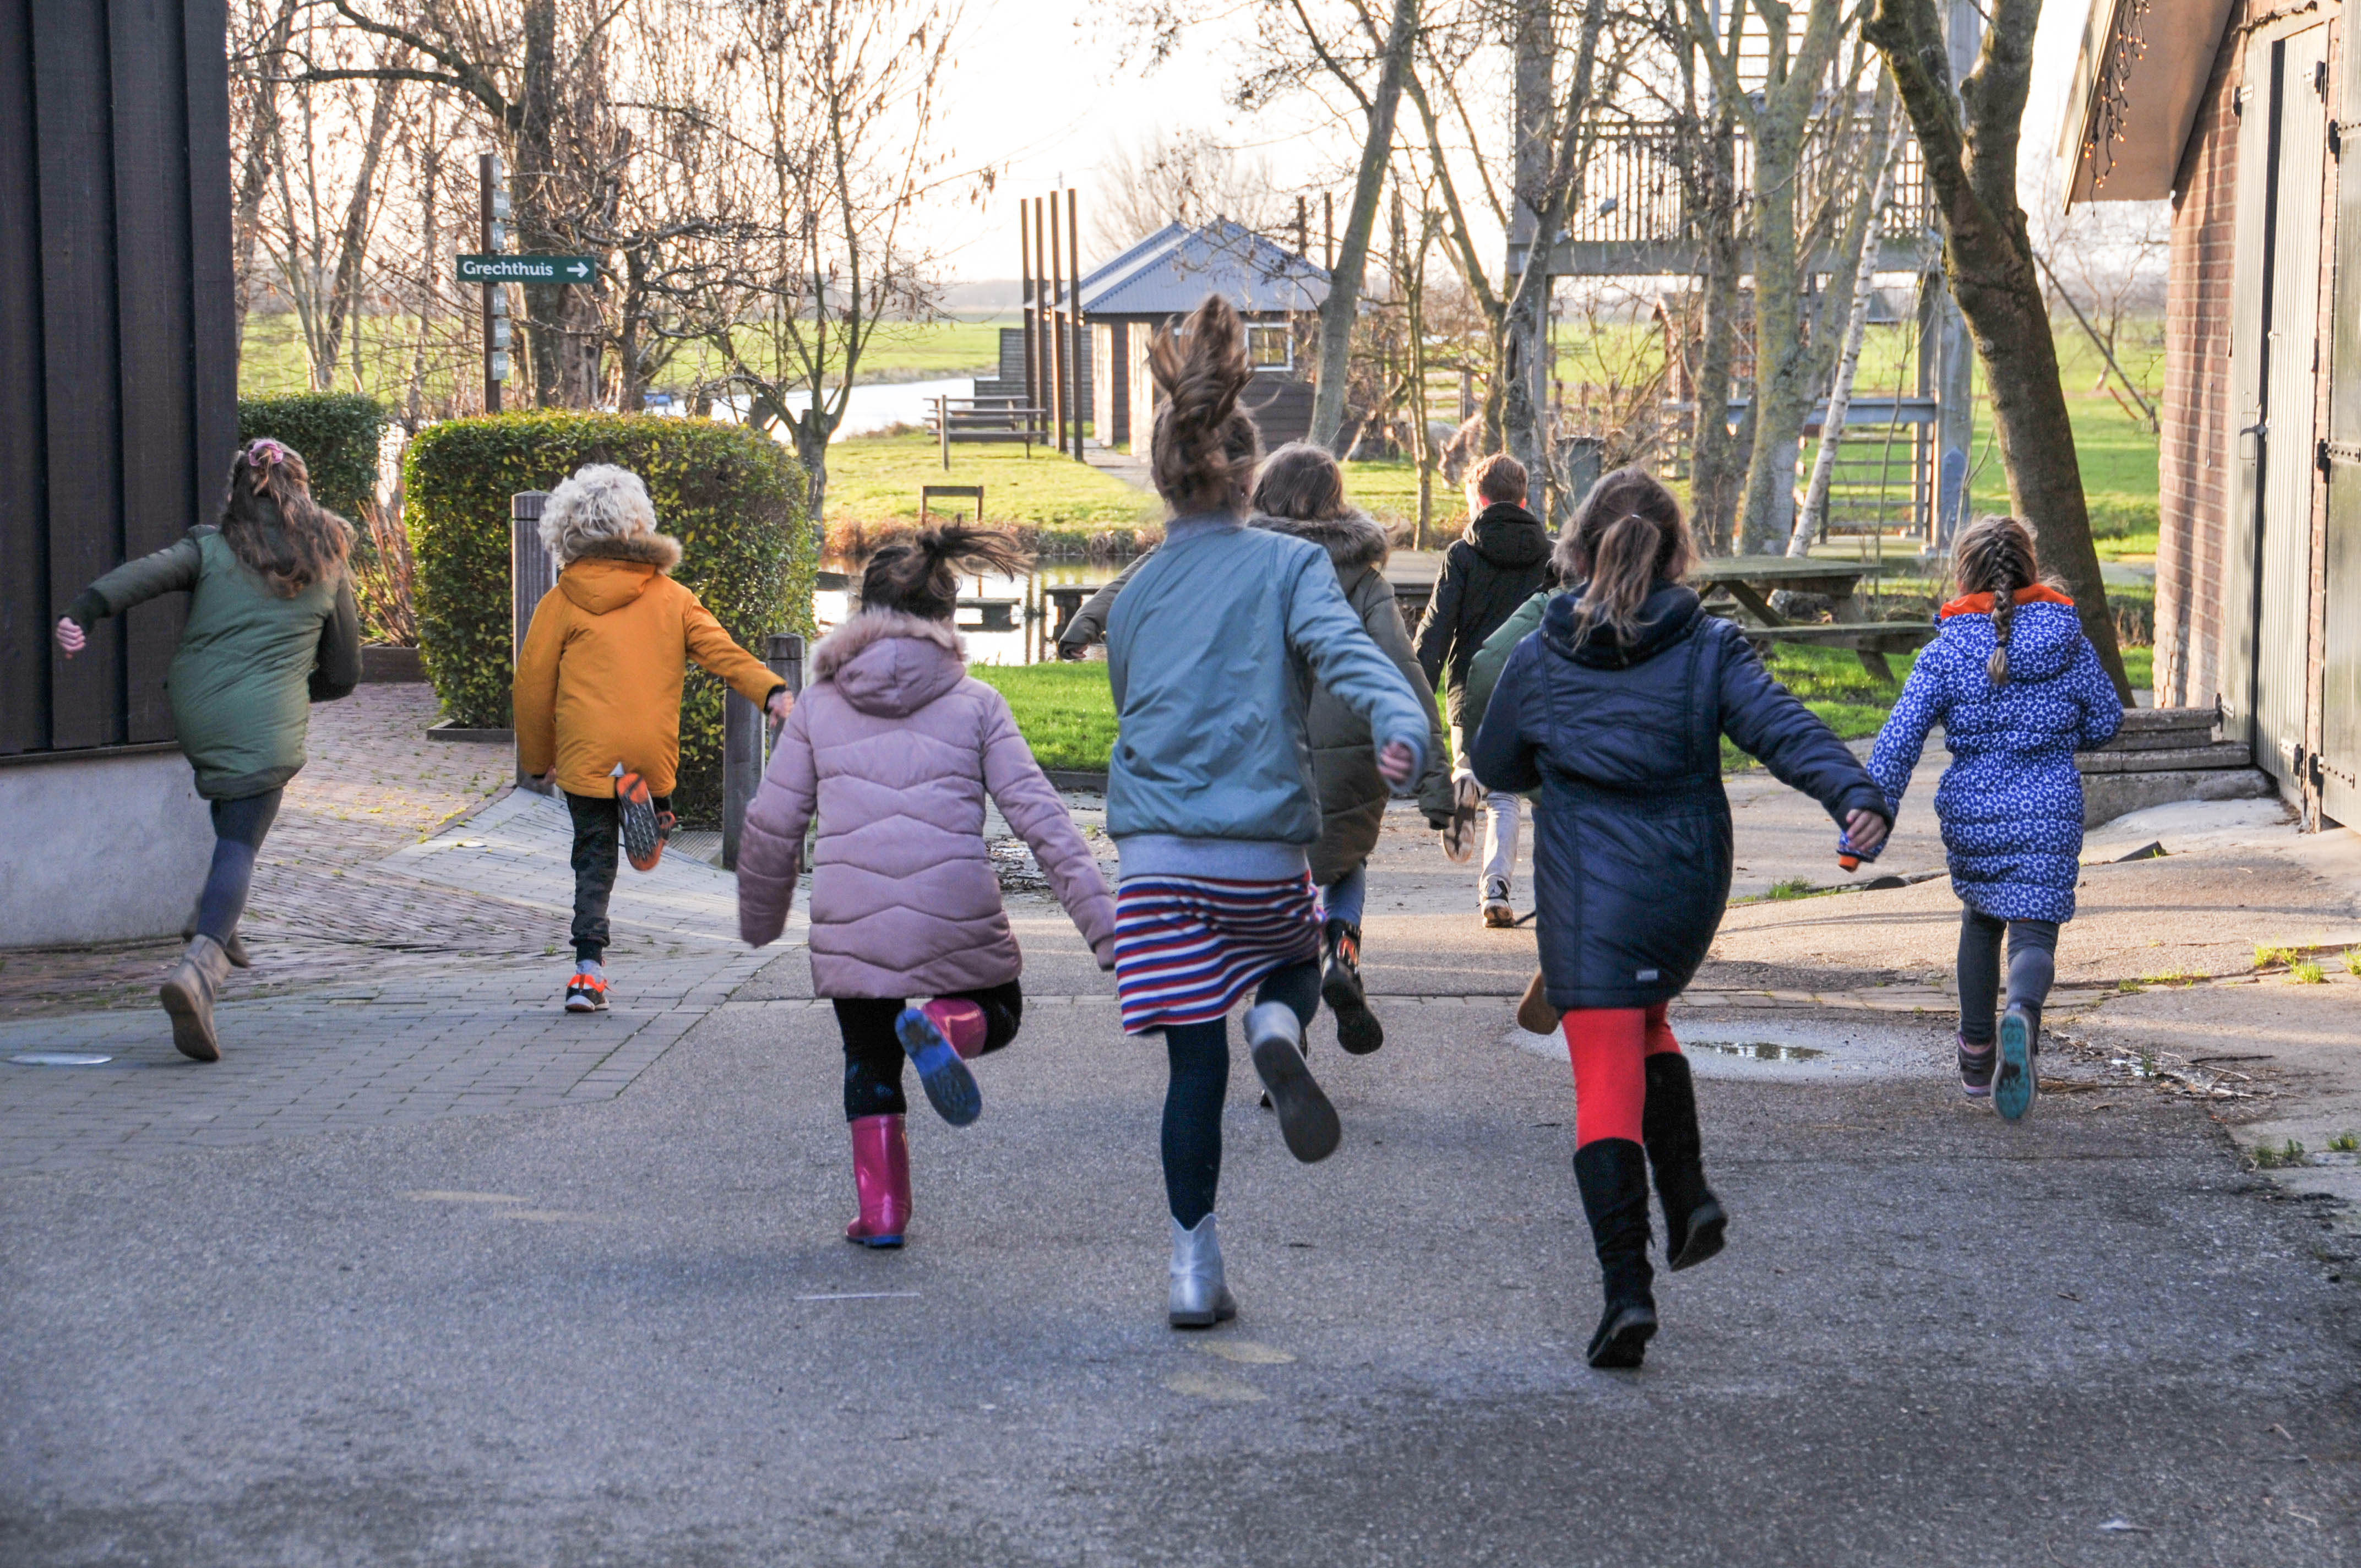 Kinderfeestje boerenstalspelen organiseren bij Booerderij de Boerinn